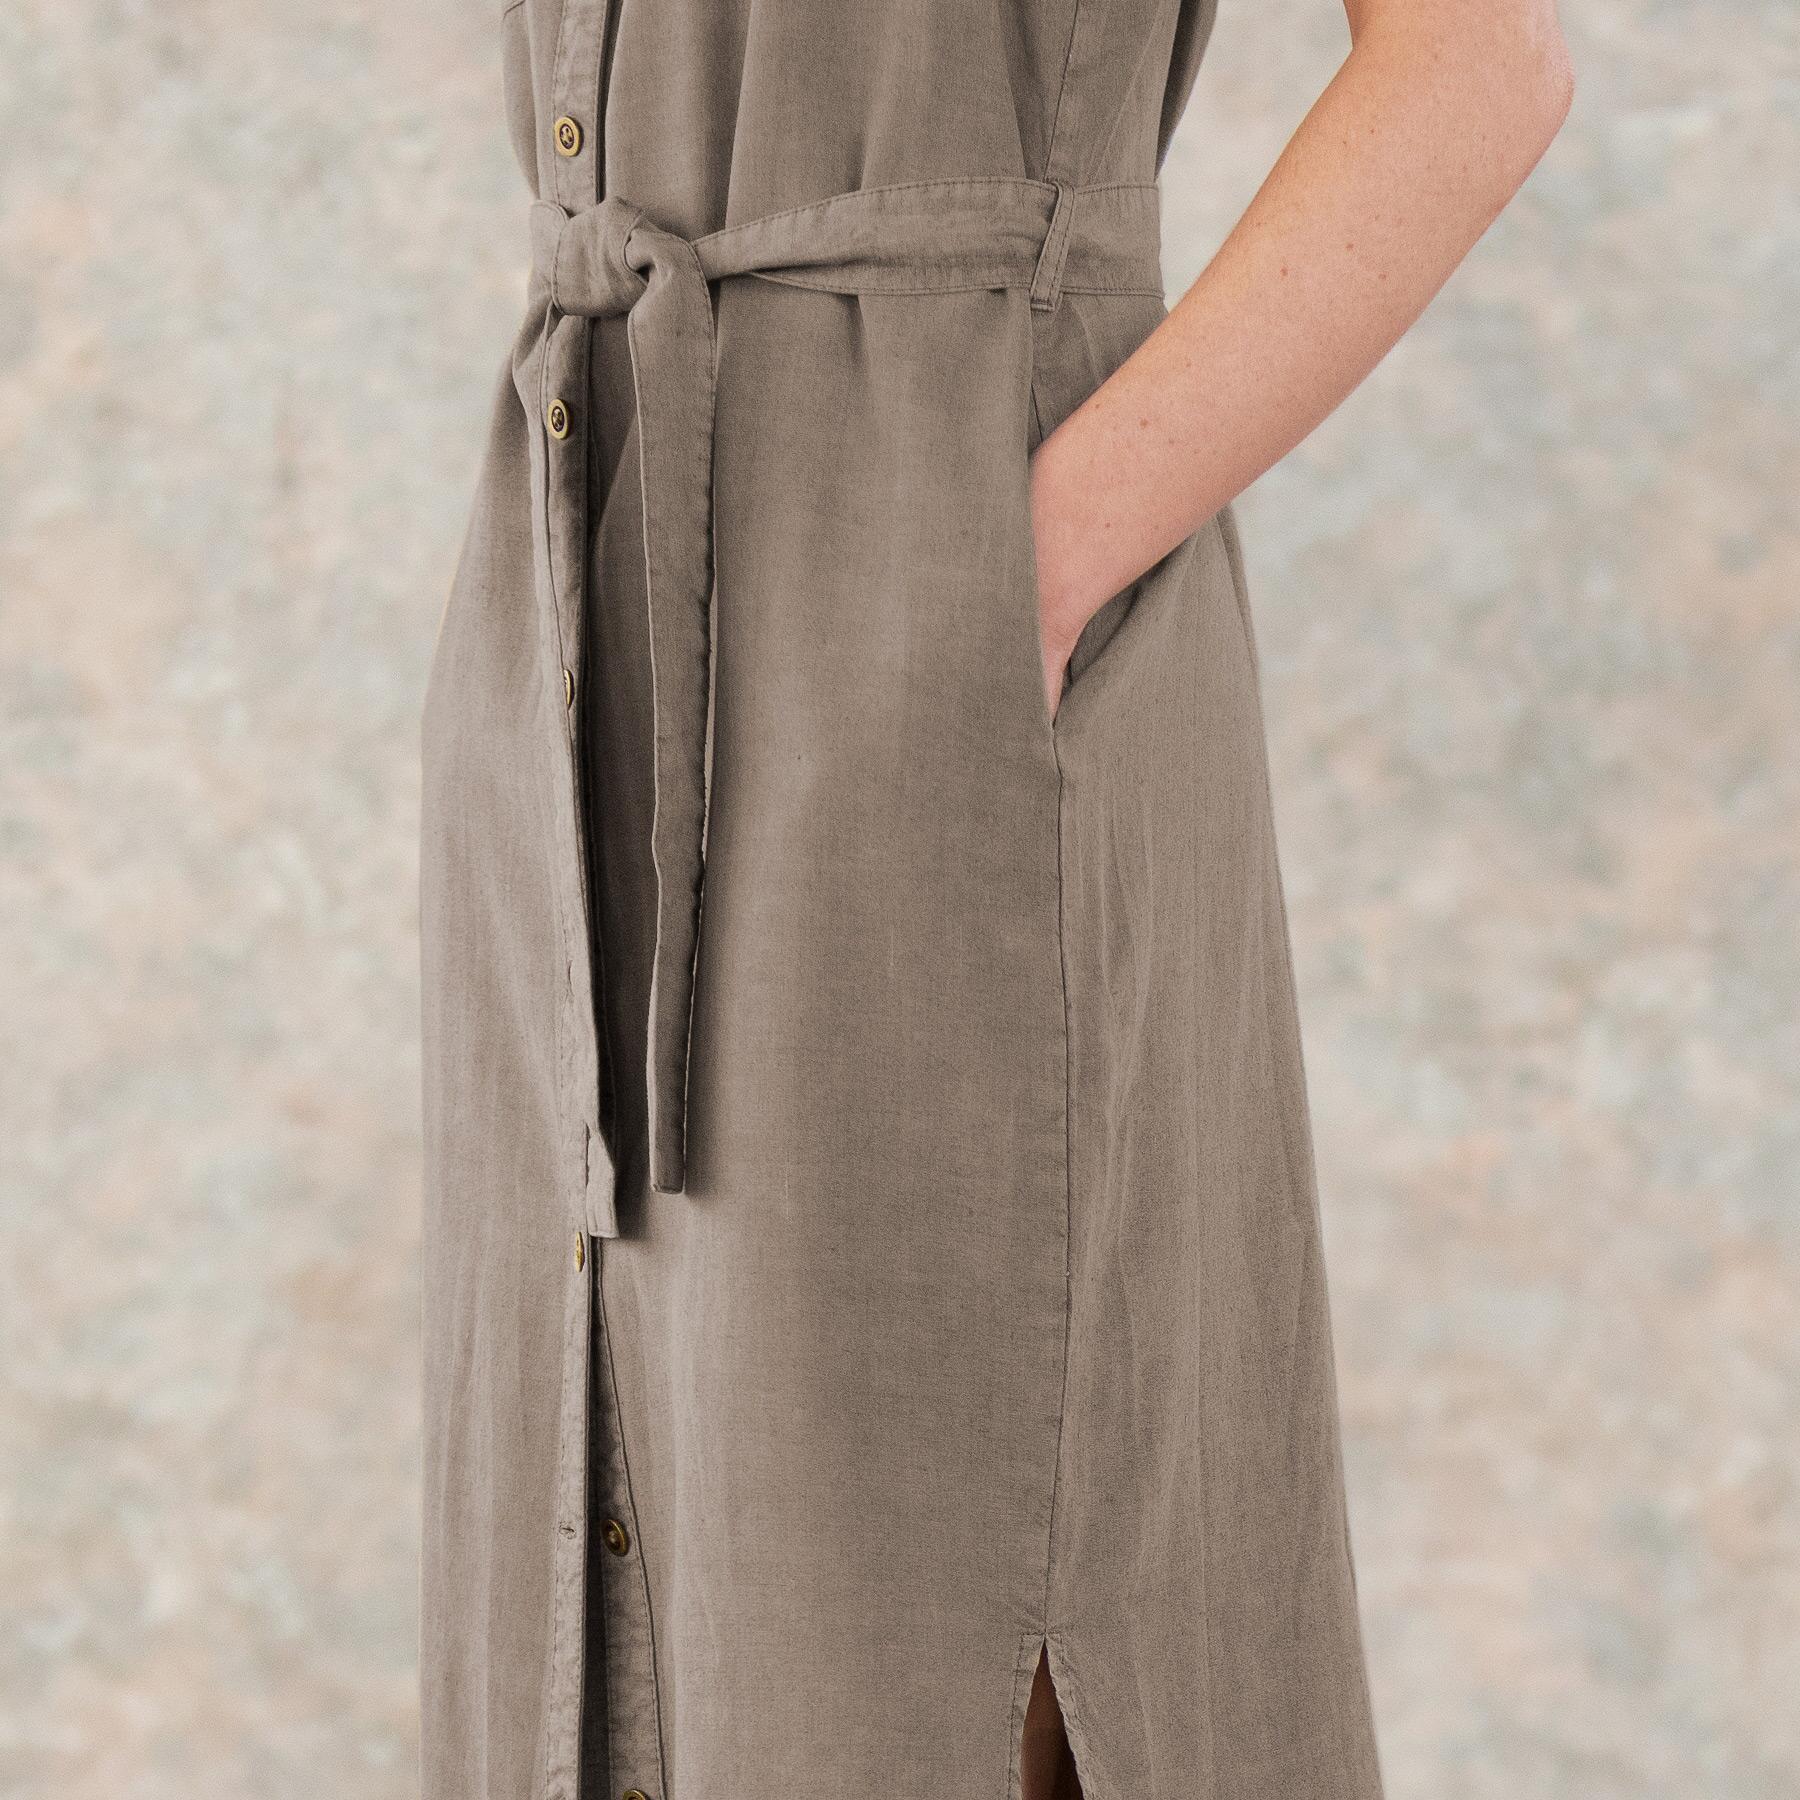 WESTWARD DRESS - PETITES: View 5